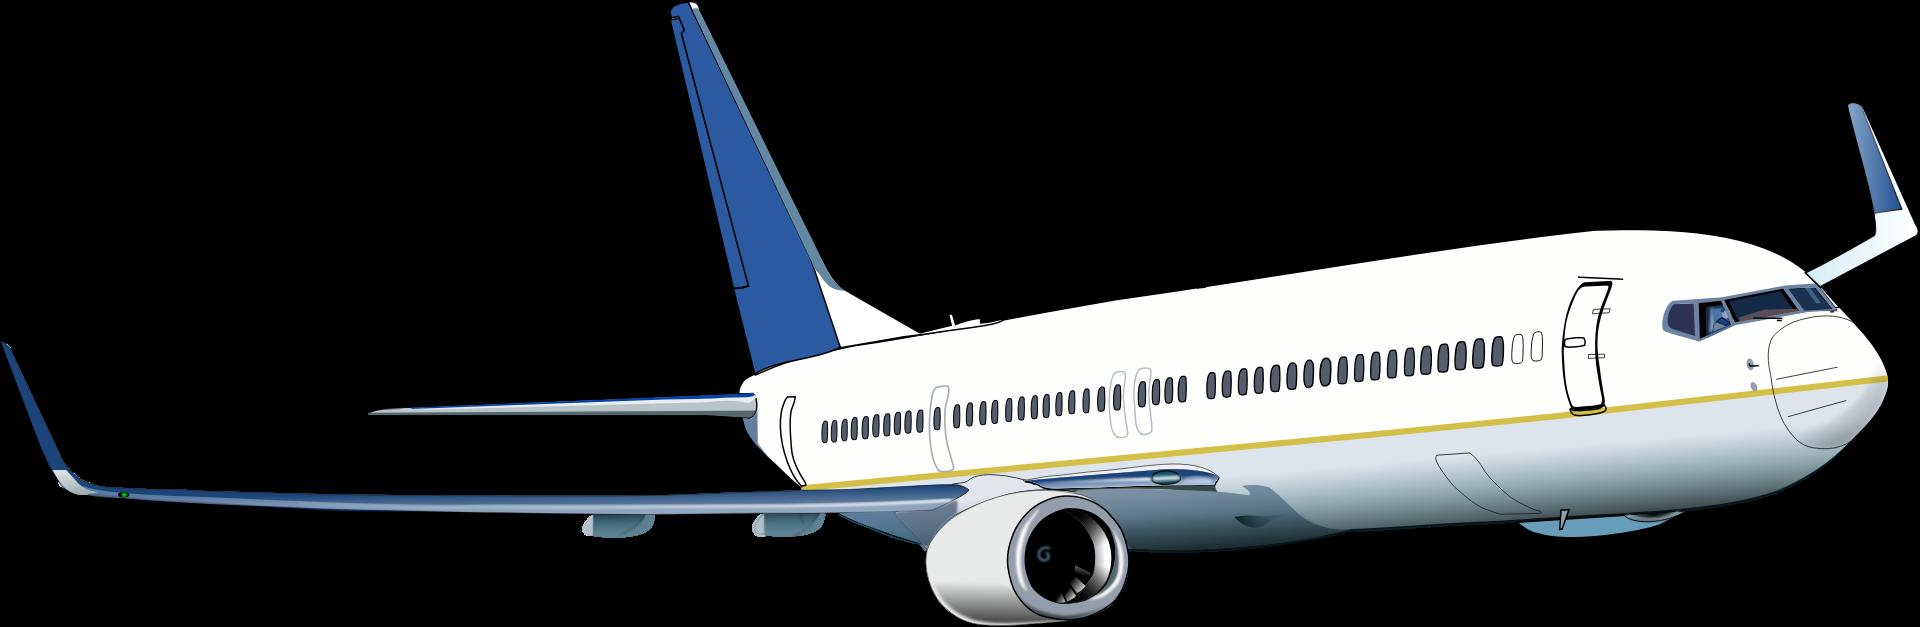 Clipart plane transparent background. Boeing png mart